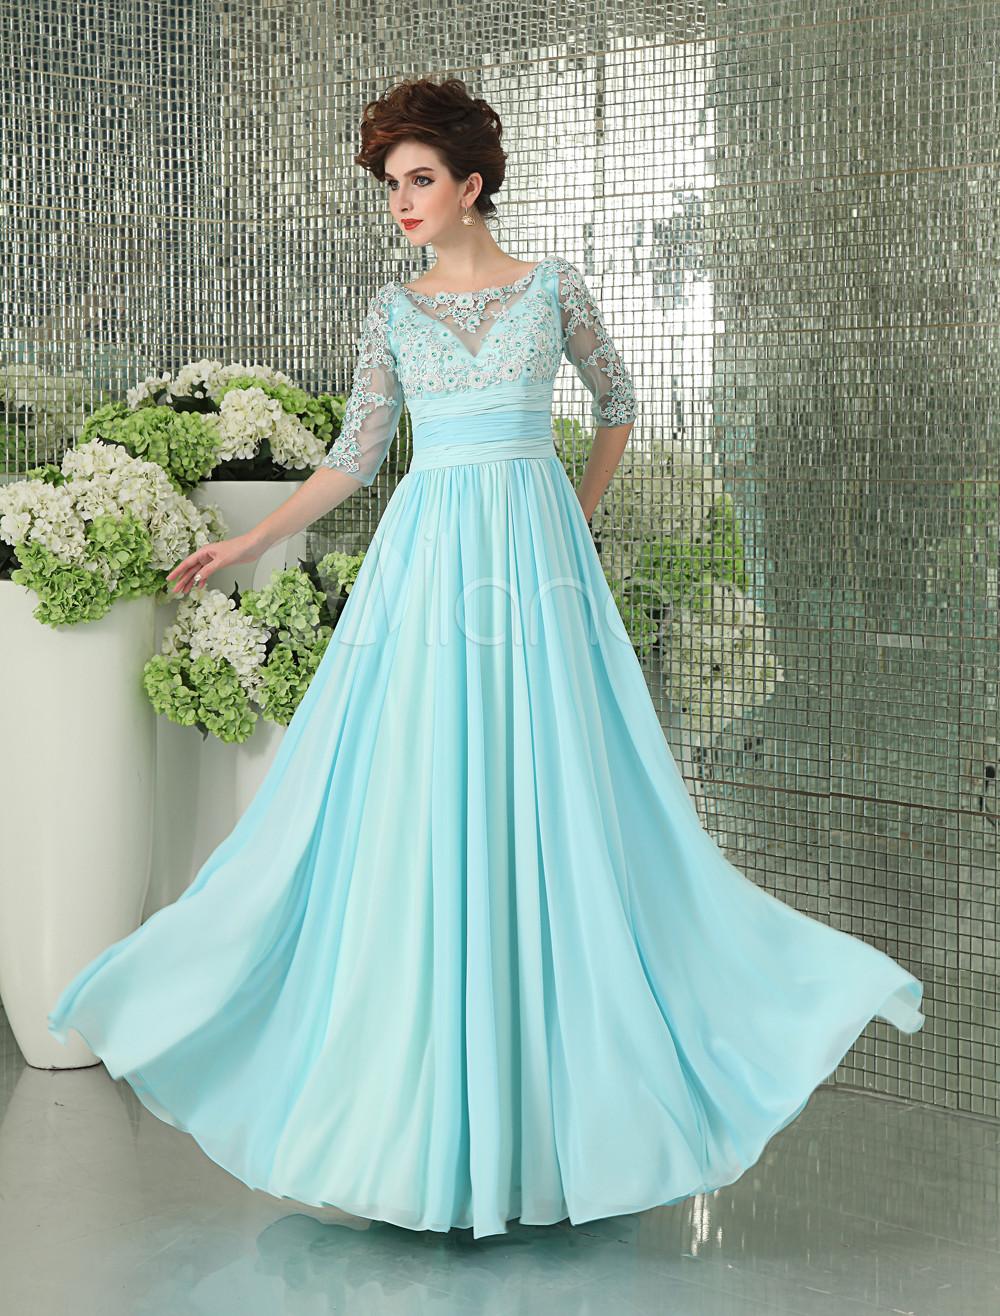 Mint Green Prom Dress Illusion Half Sleeve Chiffon Evening Dress Lace Beading  Floor Length Formal Dress  Milanoo